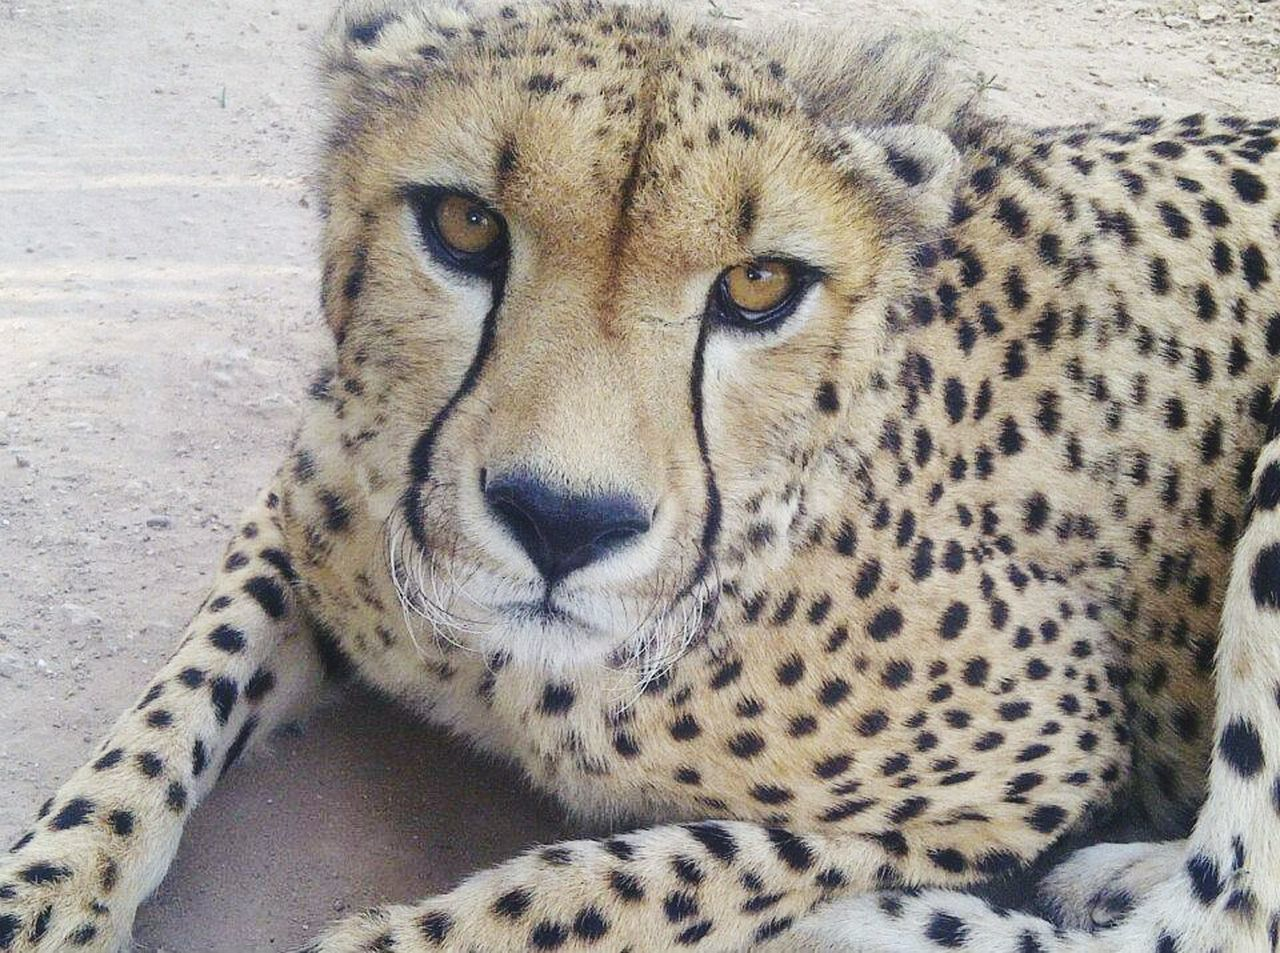 Bigcats Bigcatphotography BigCatLover Prediters Lions Cheetah Lepord Cat